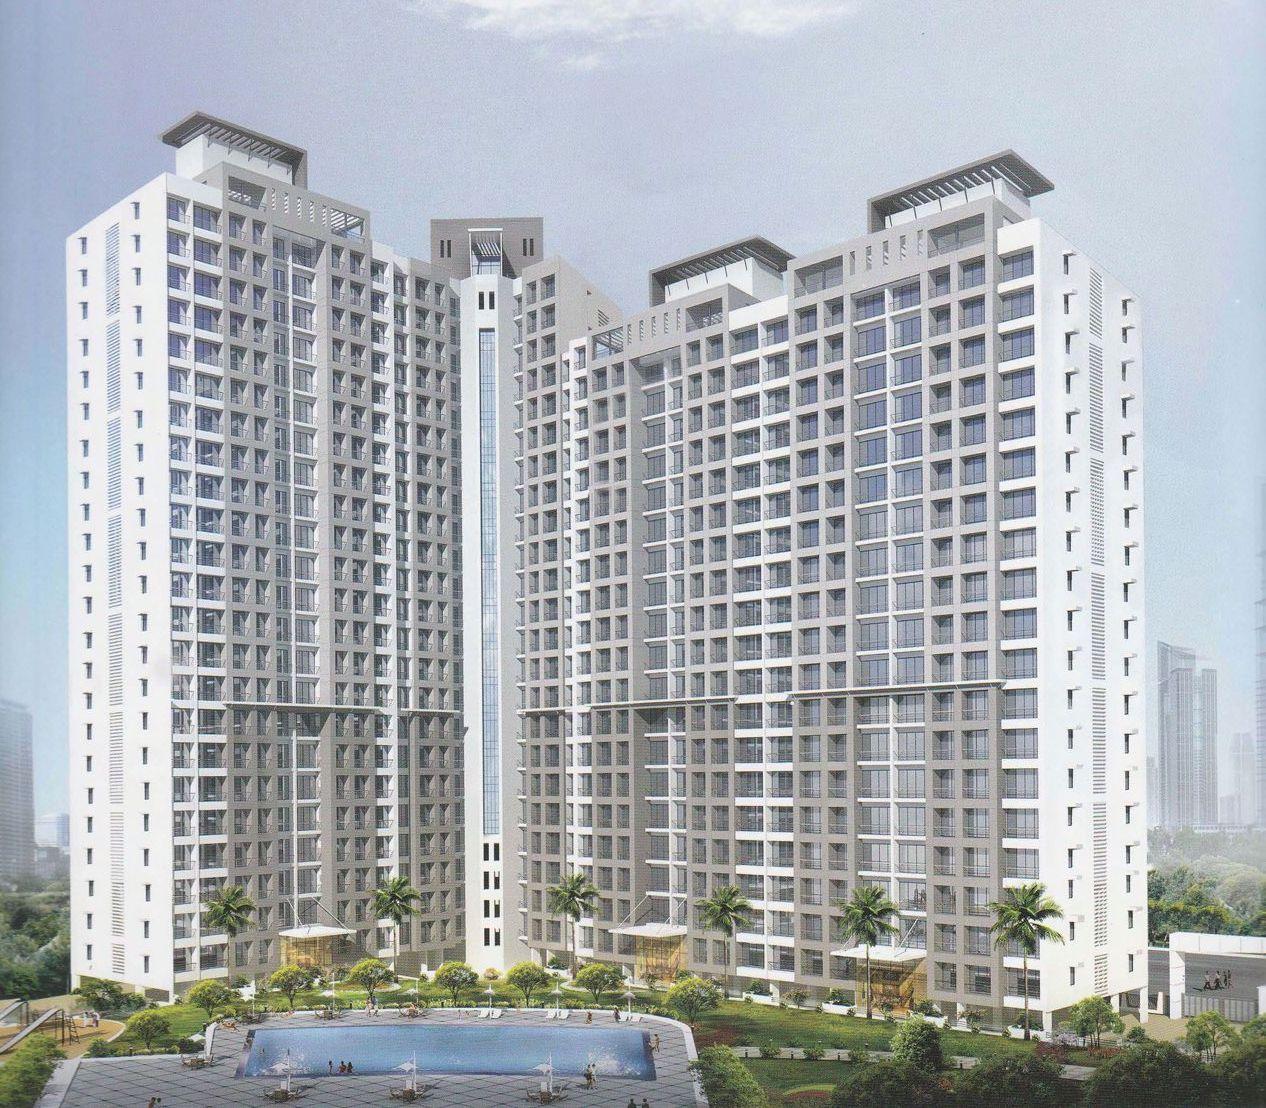 Kakad Paradise, Mumbai - 1 & 2 BHK Apartments for sale